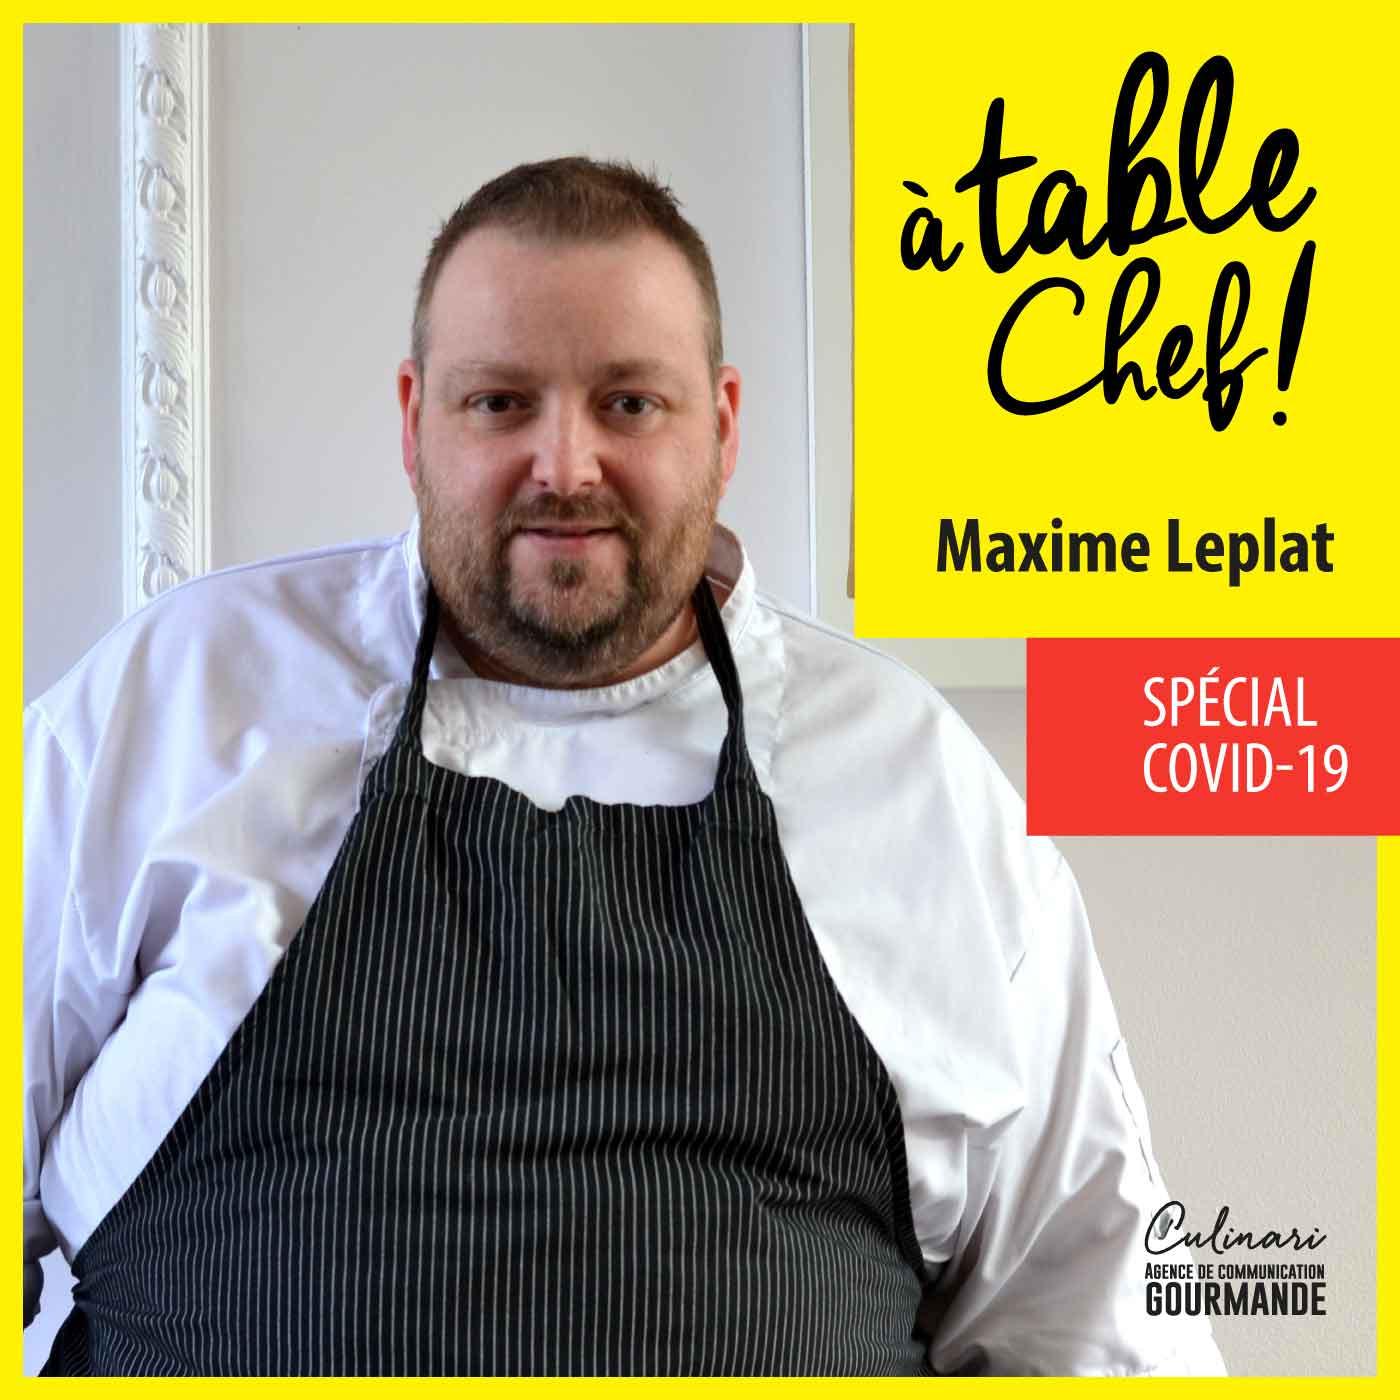 Chef Maxime Leplat